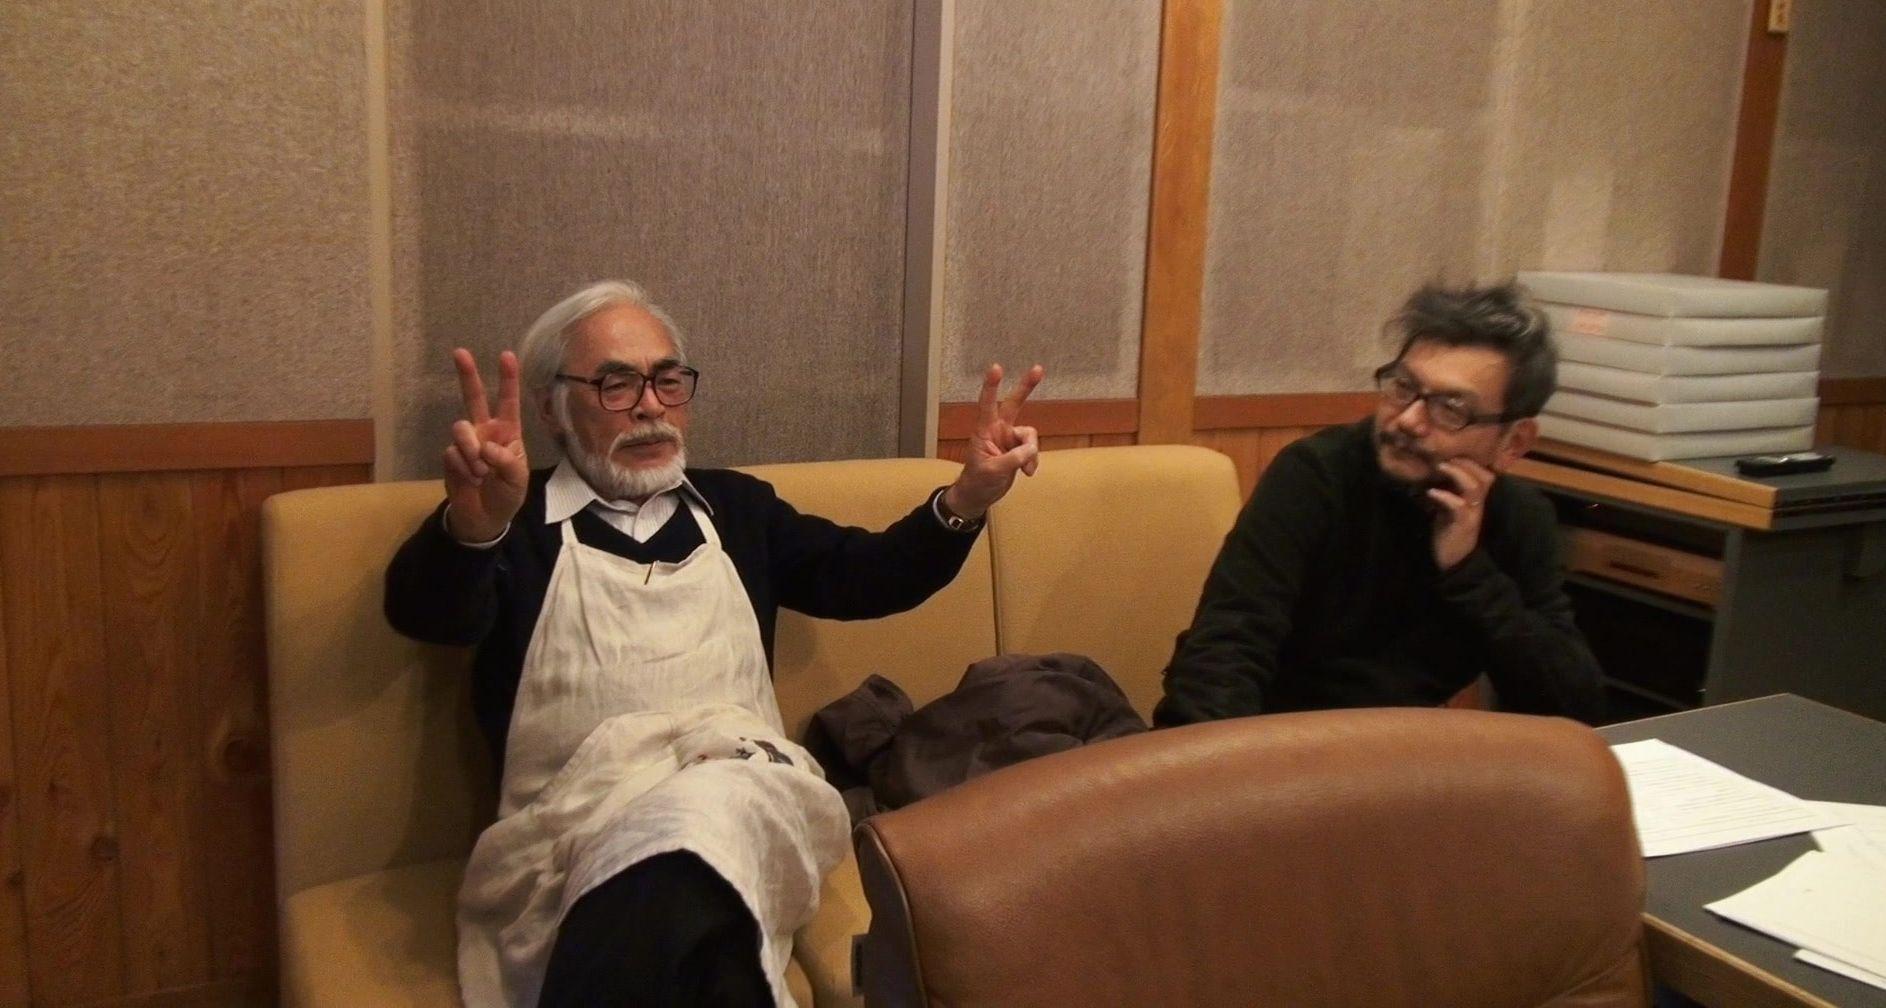 Hayao Miyazaki peace in documentary The Kingdom of Dreams an